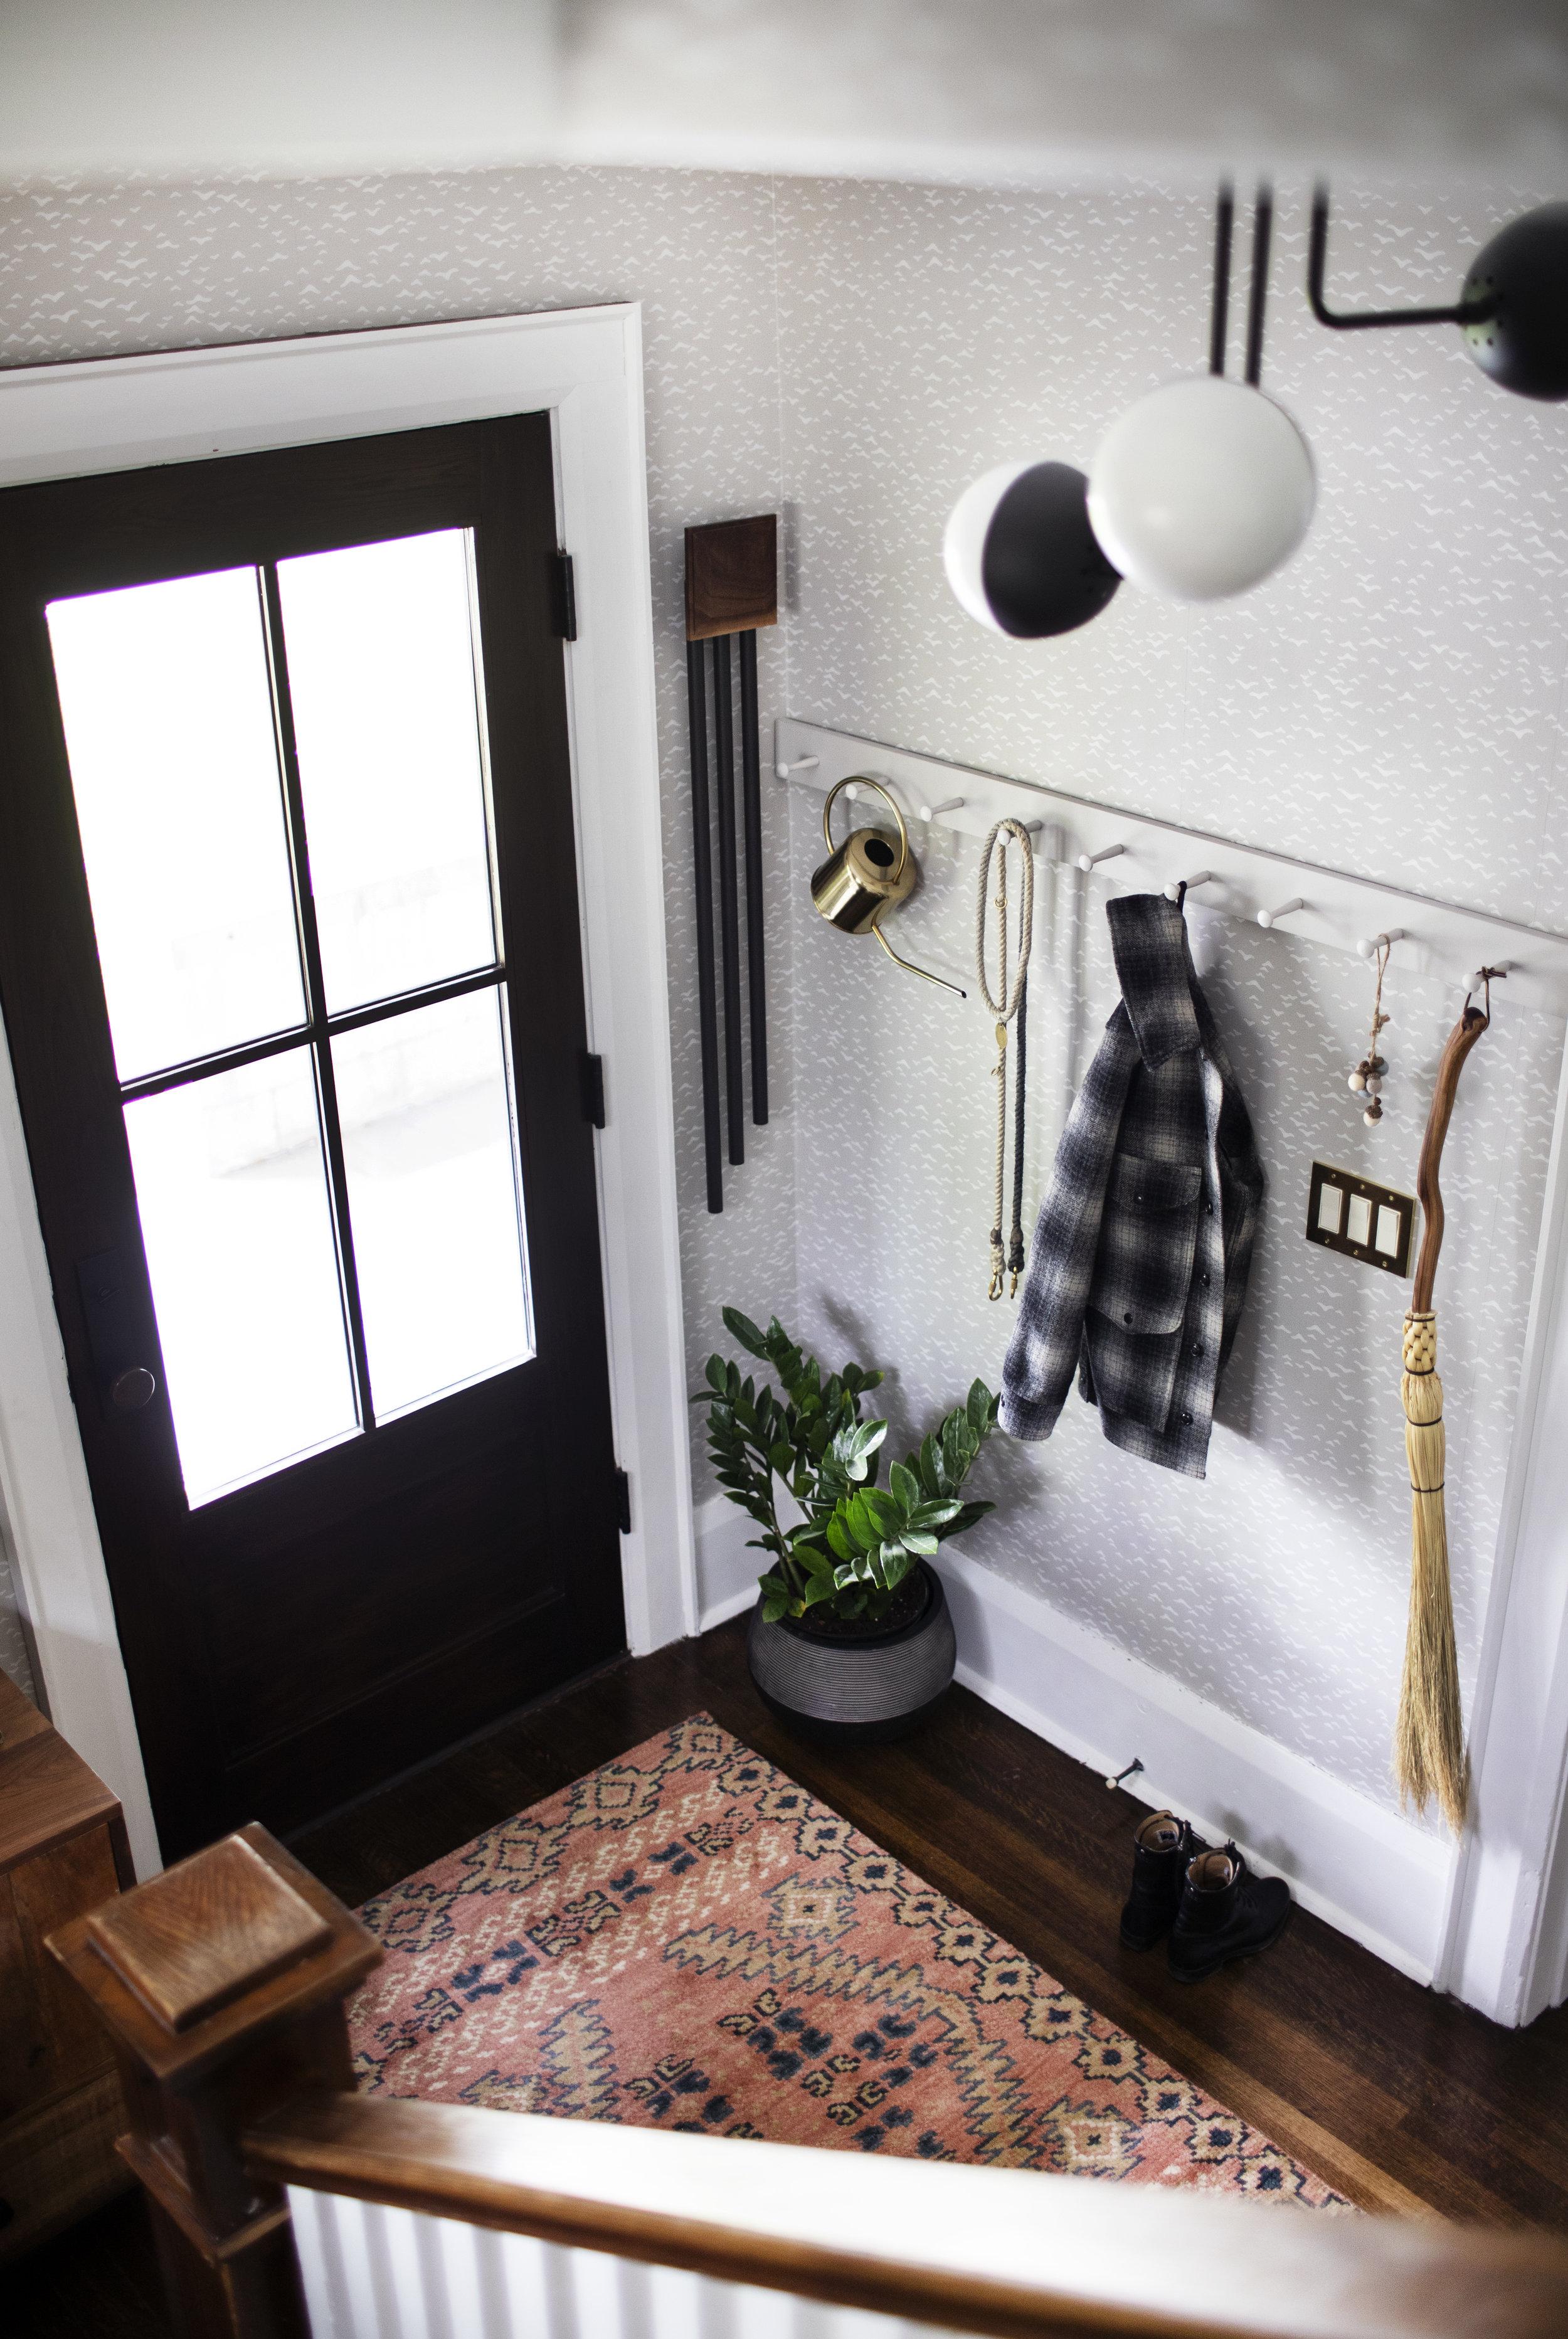 wallpaper front entry iii.jpg